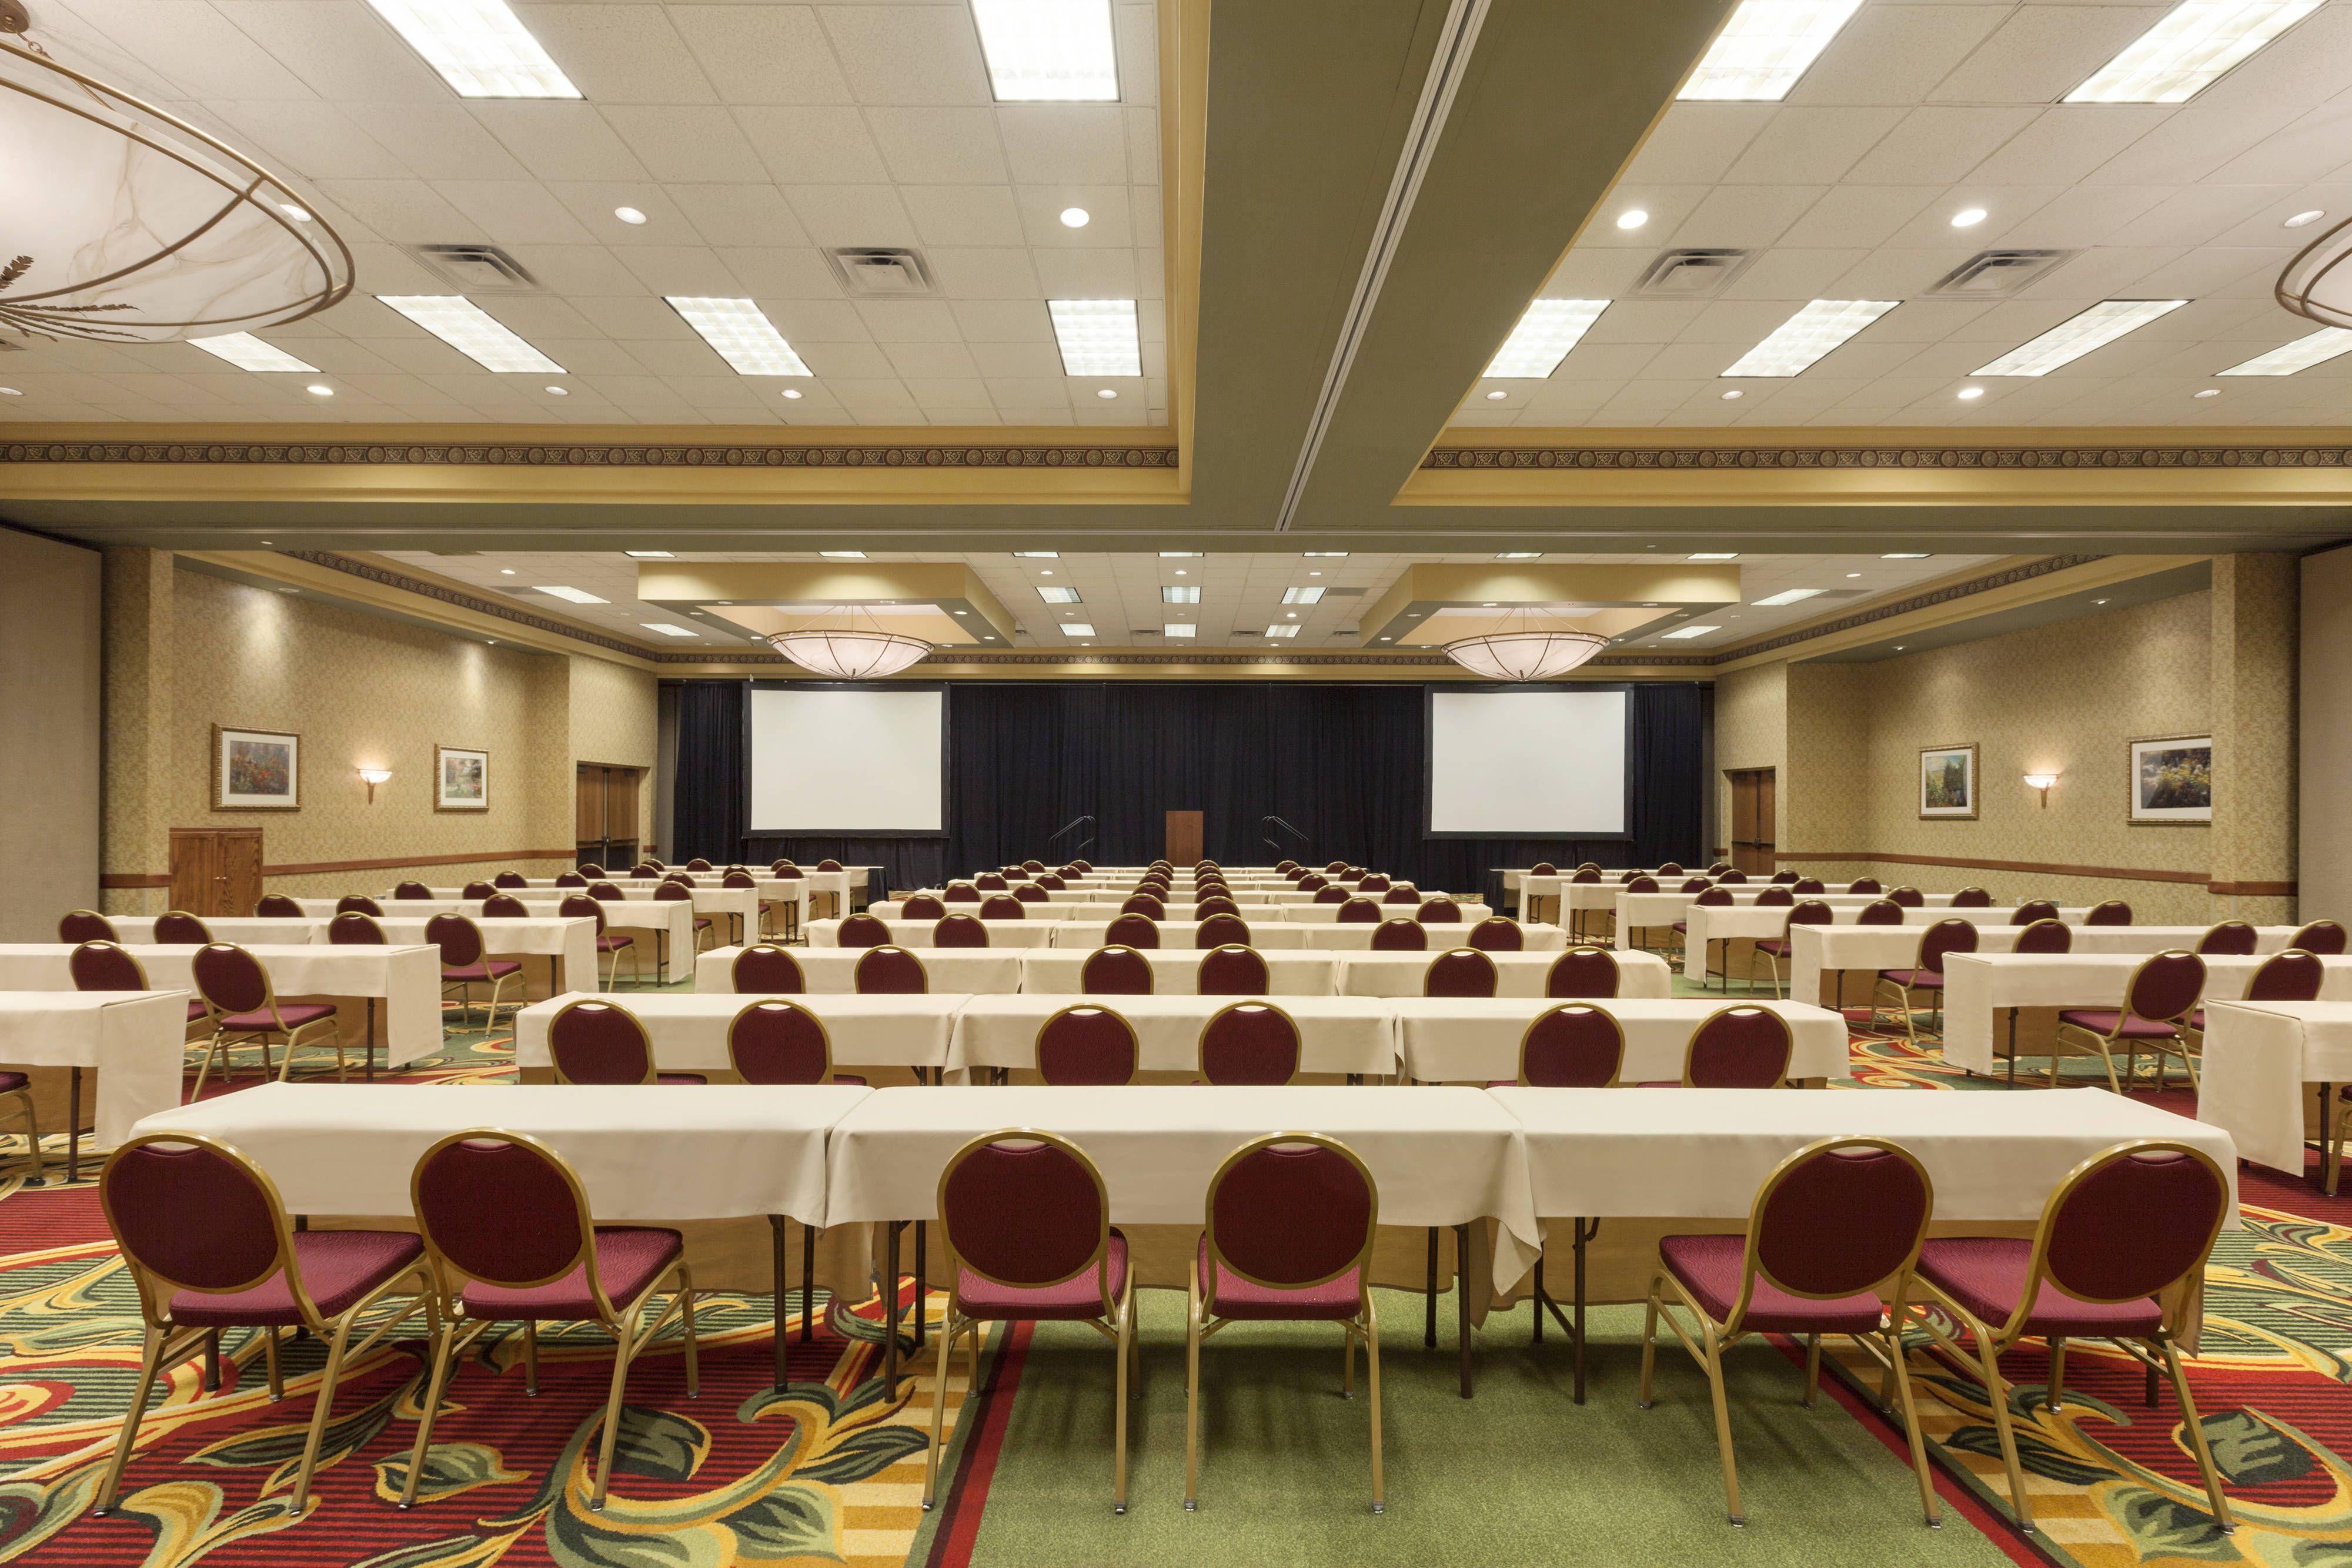 Cedar rapids marriott grand ballroom classroom style